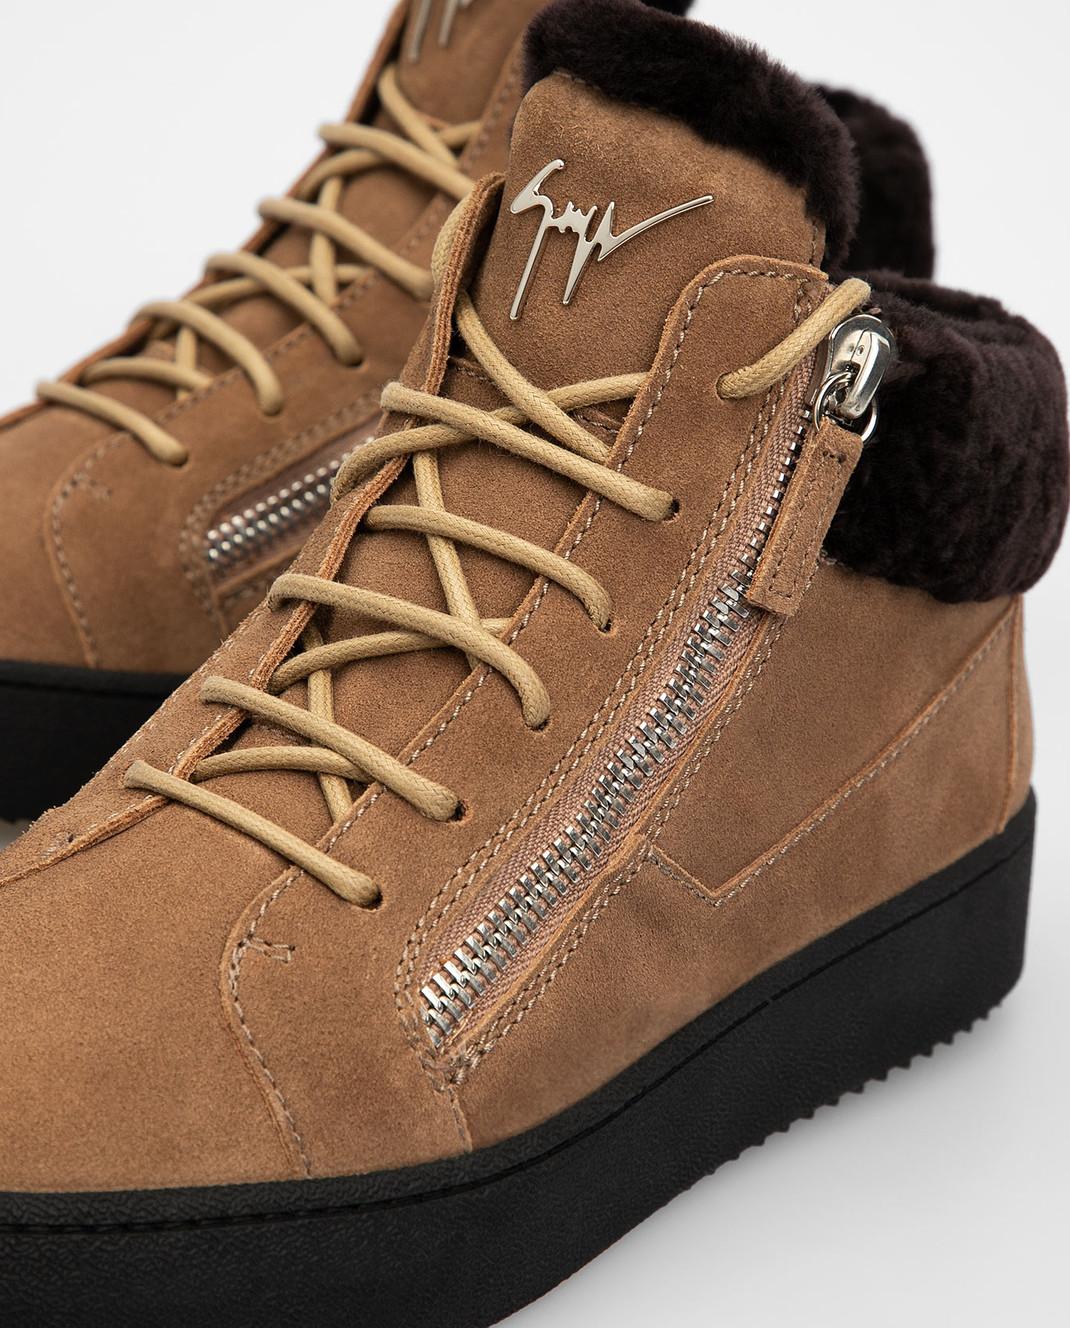 Giuseppe Zanotti Бежевые замшевые ботинки изображение 5